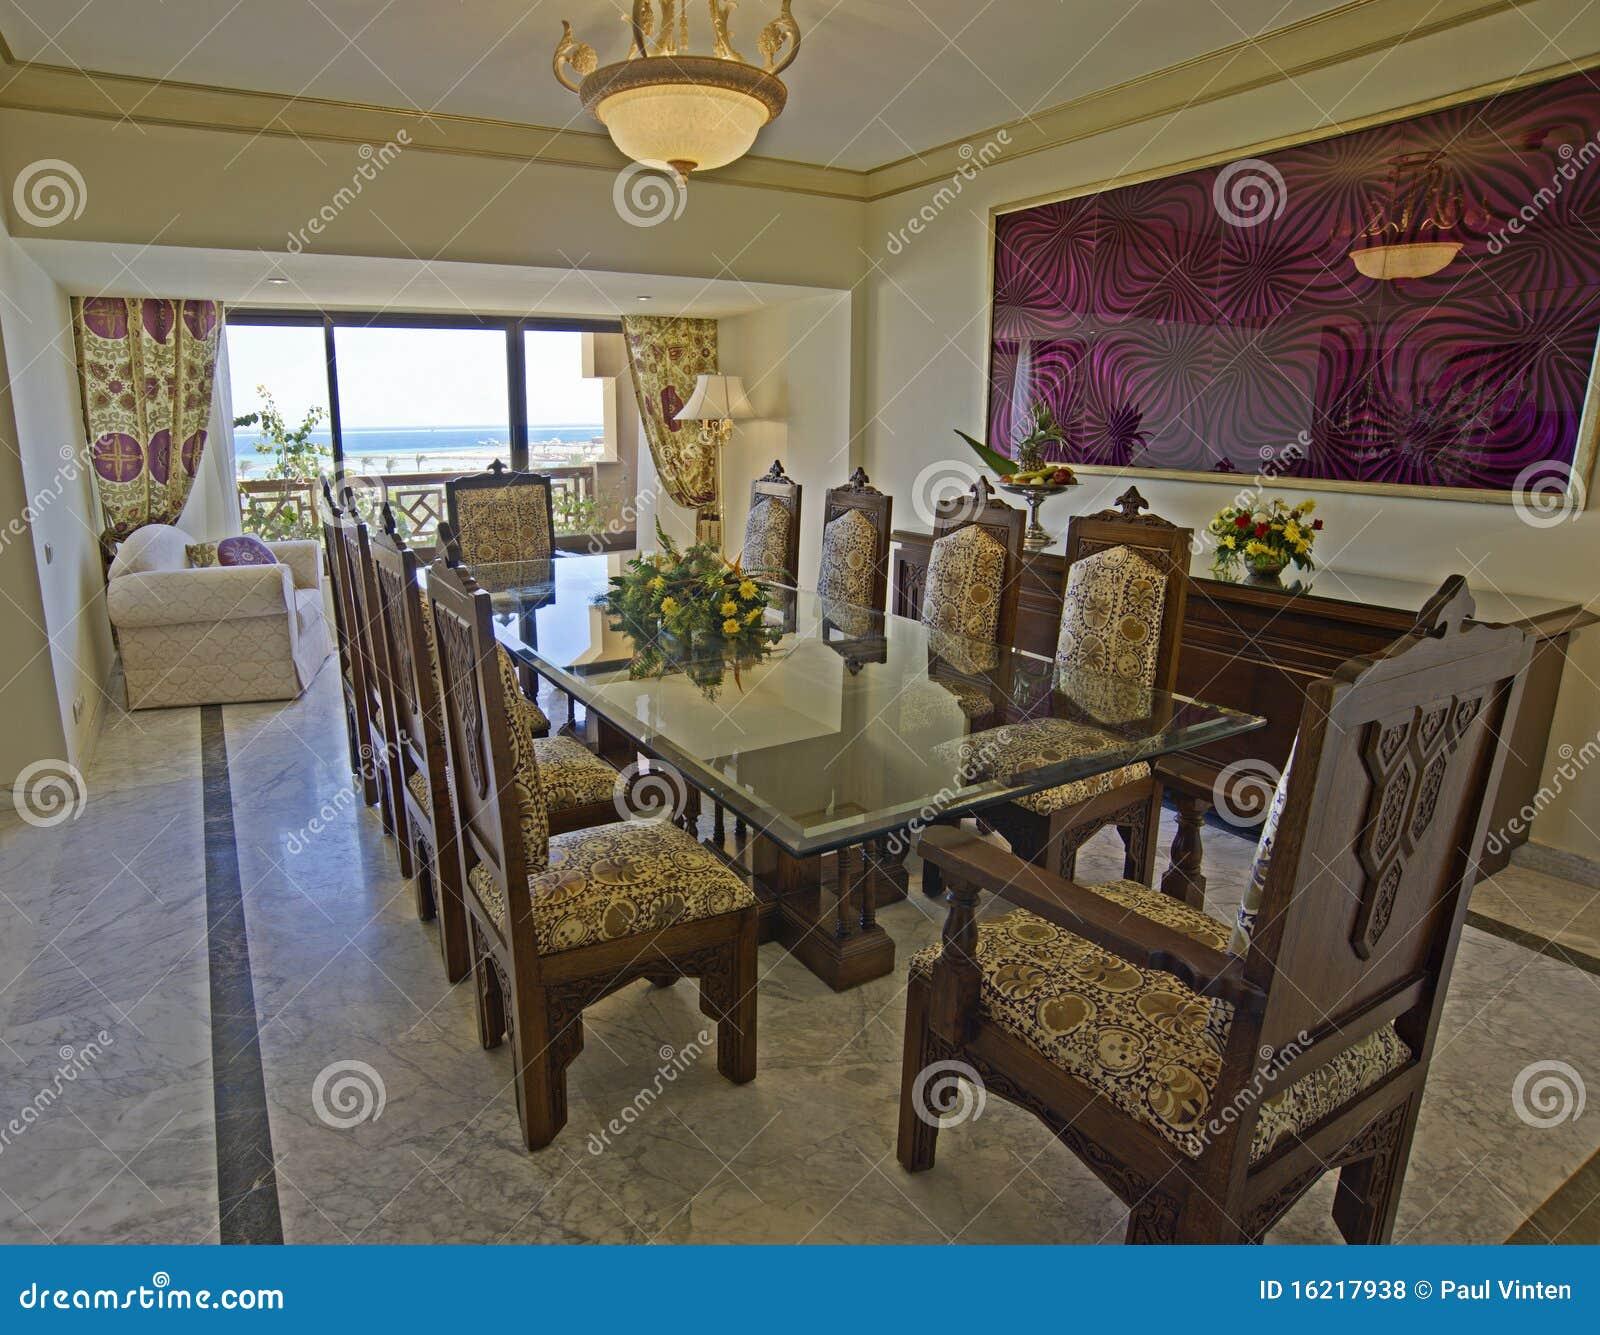 Salle manger de luxe avec une vue de mer photos libres de droits image 16217938 - Salle a manger de luxe ...